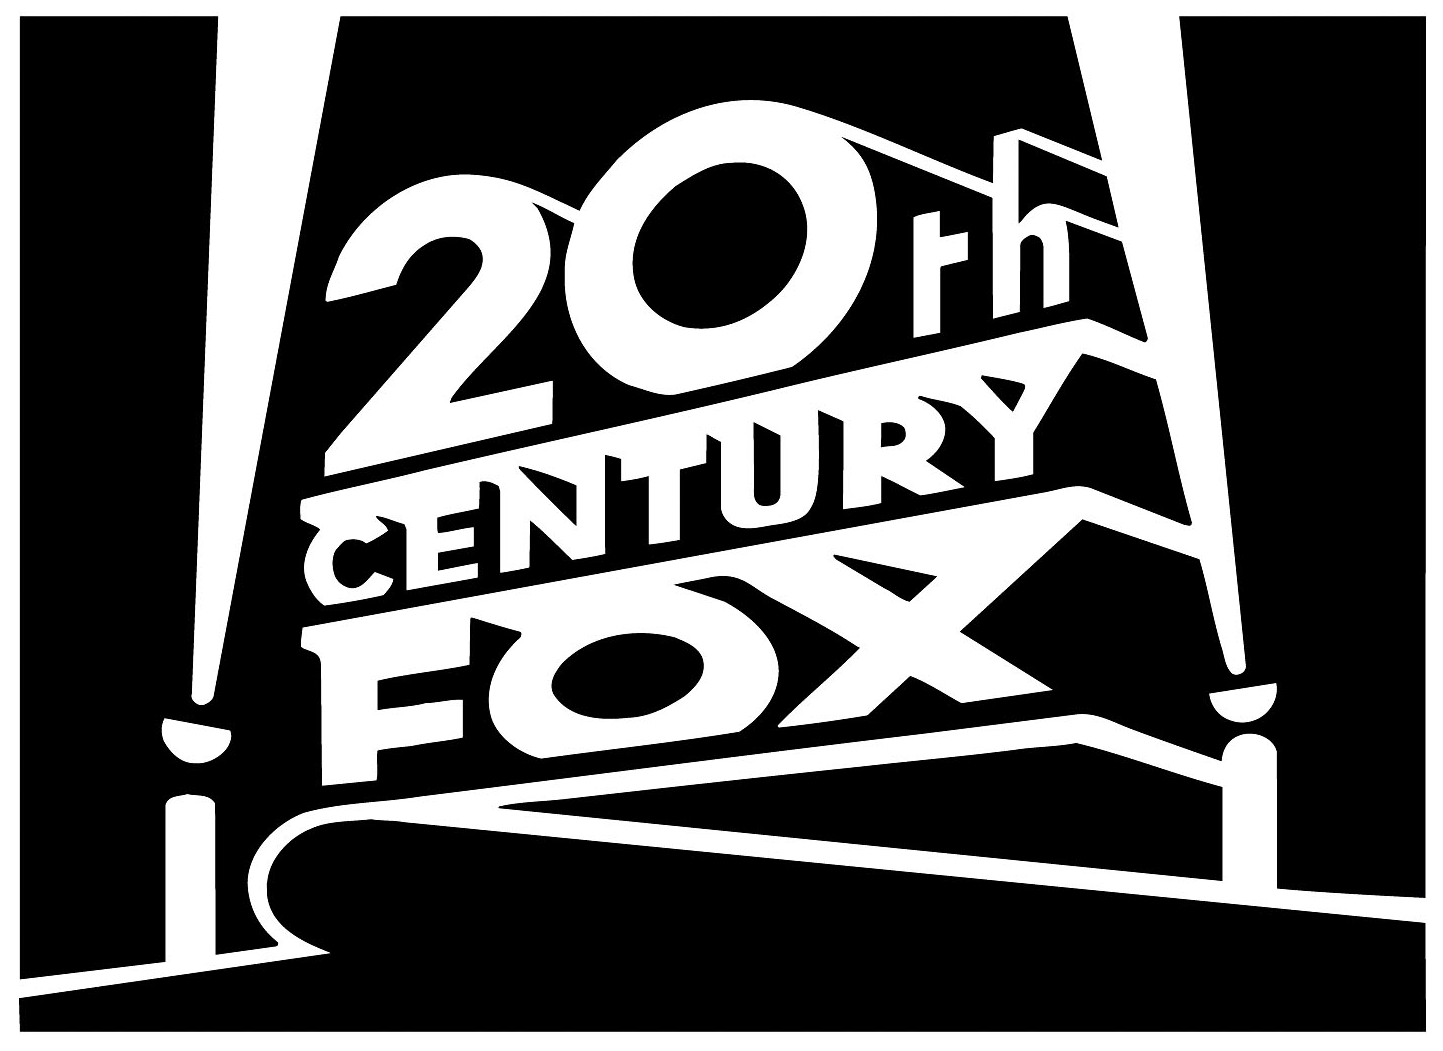 05_20th_Century_Fox.png